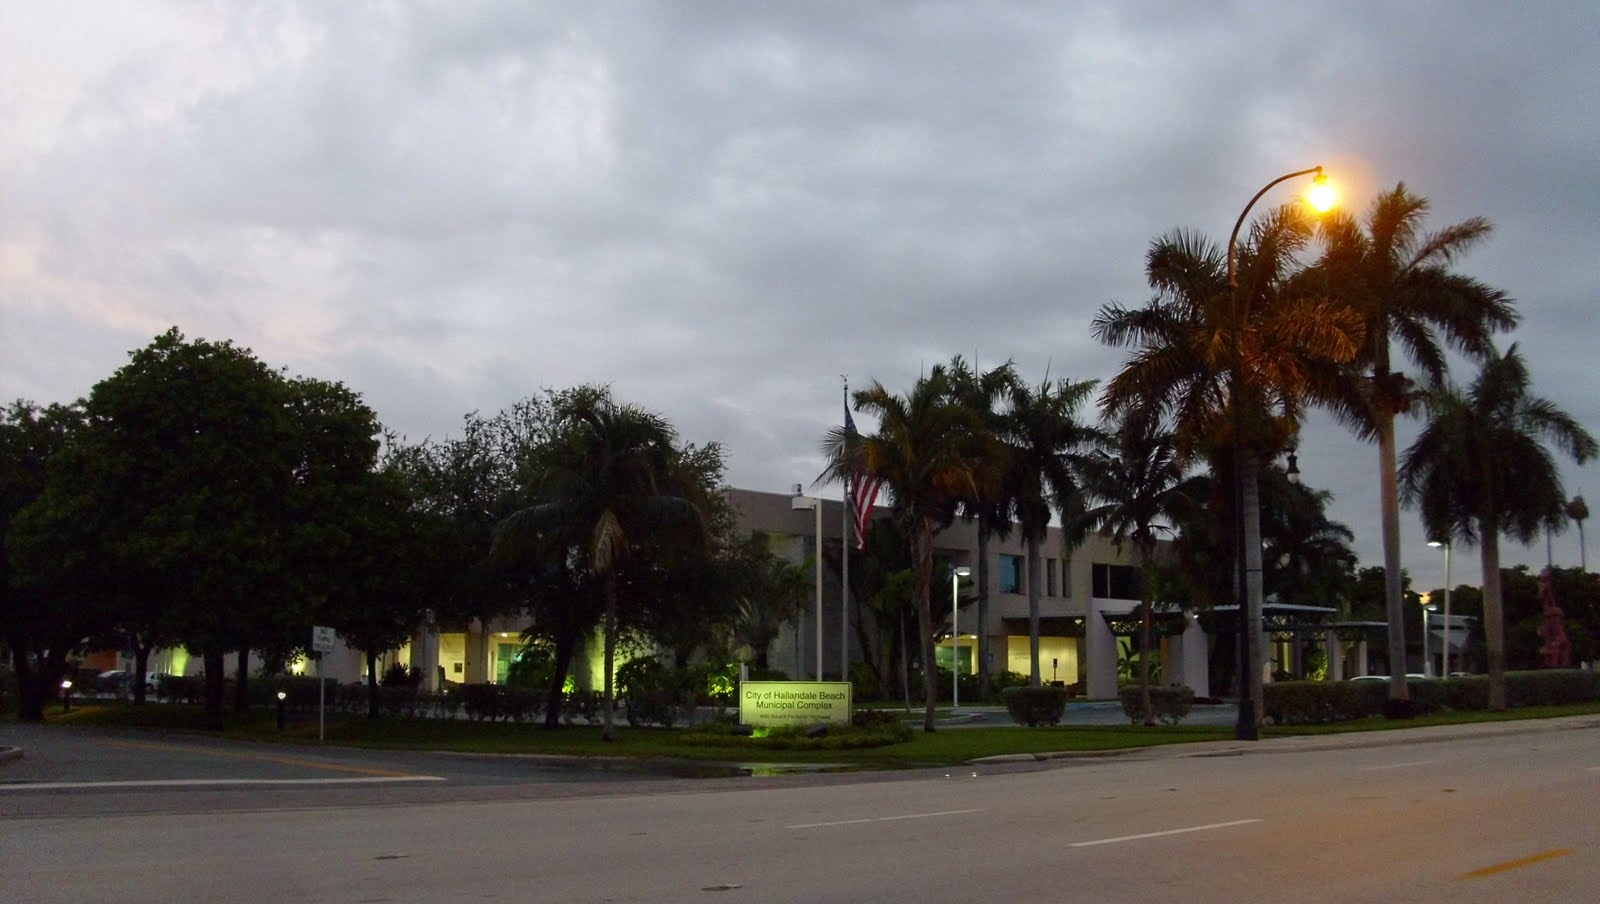 Art Adkins Ft. Lauderdale Police Department #2